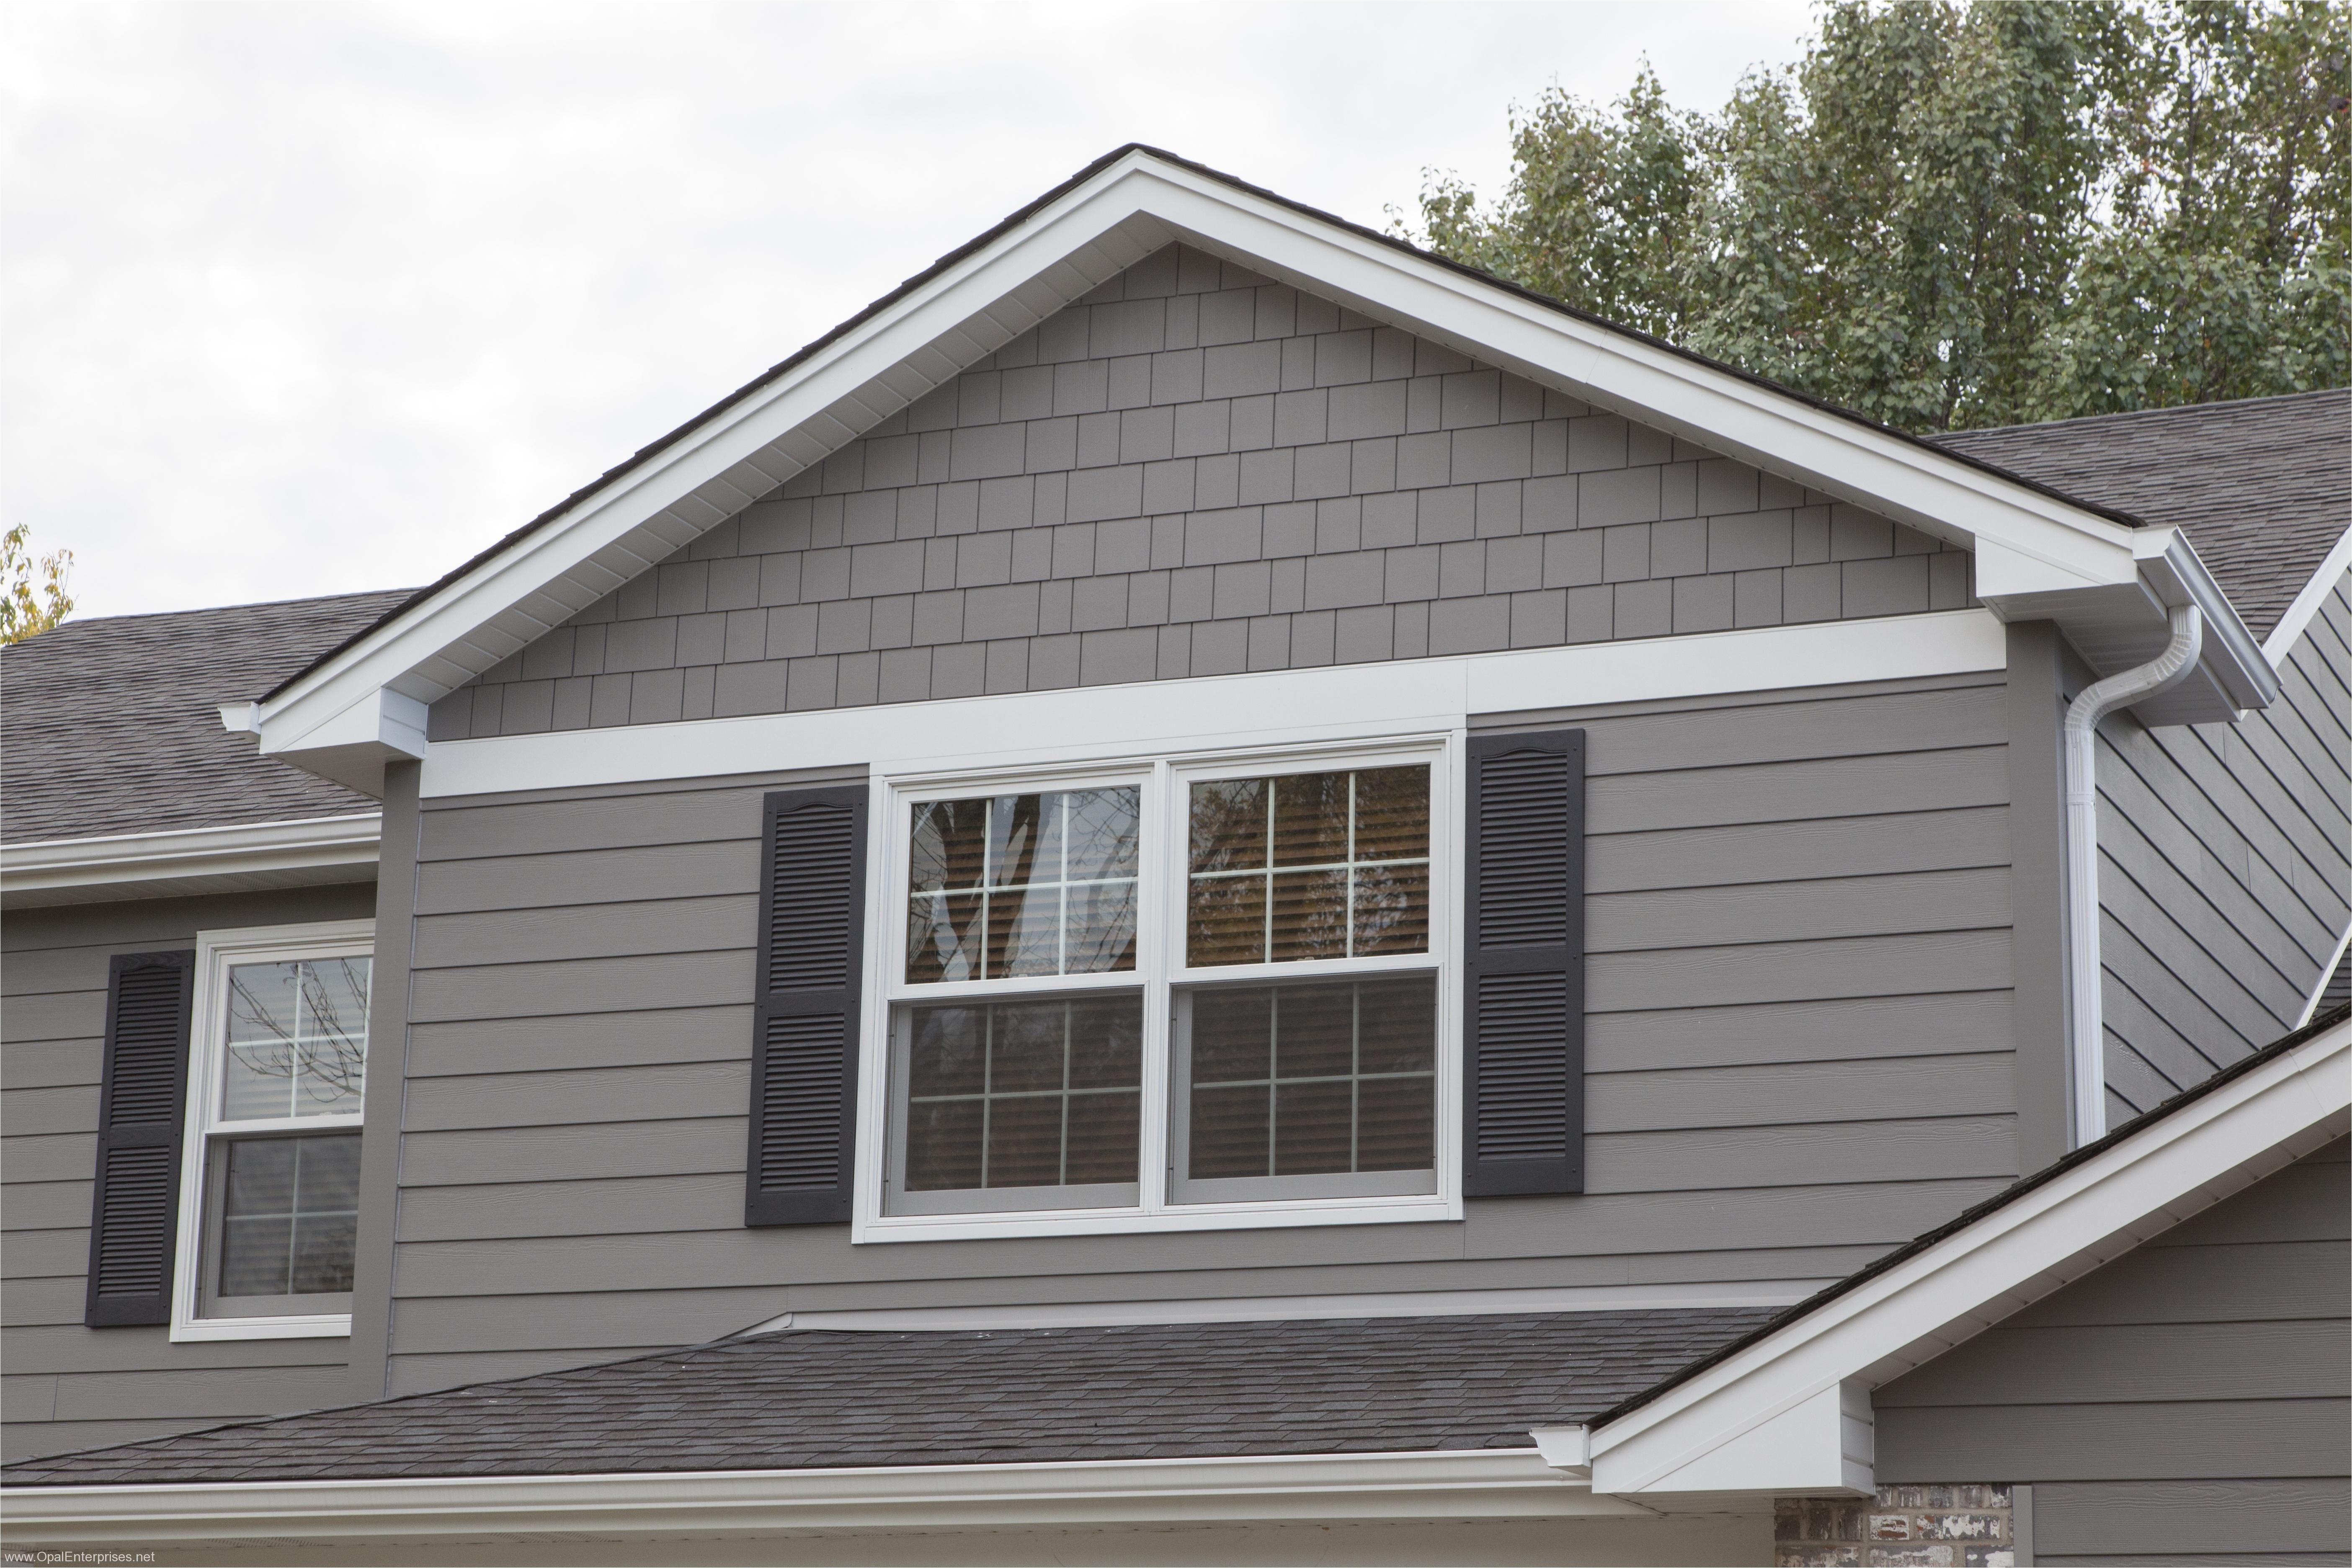 siding colors exterior house colors exterior design james hardie house front door